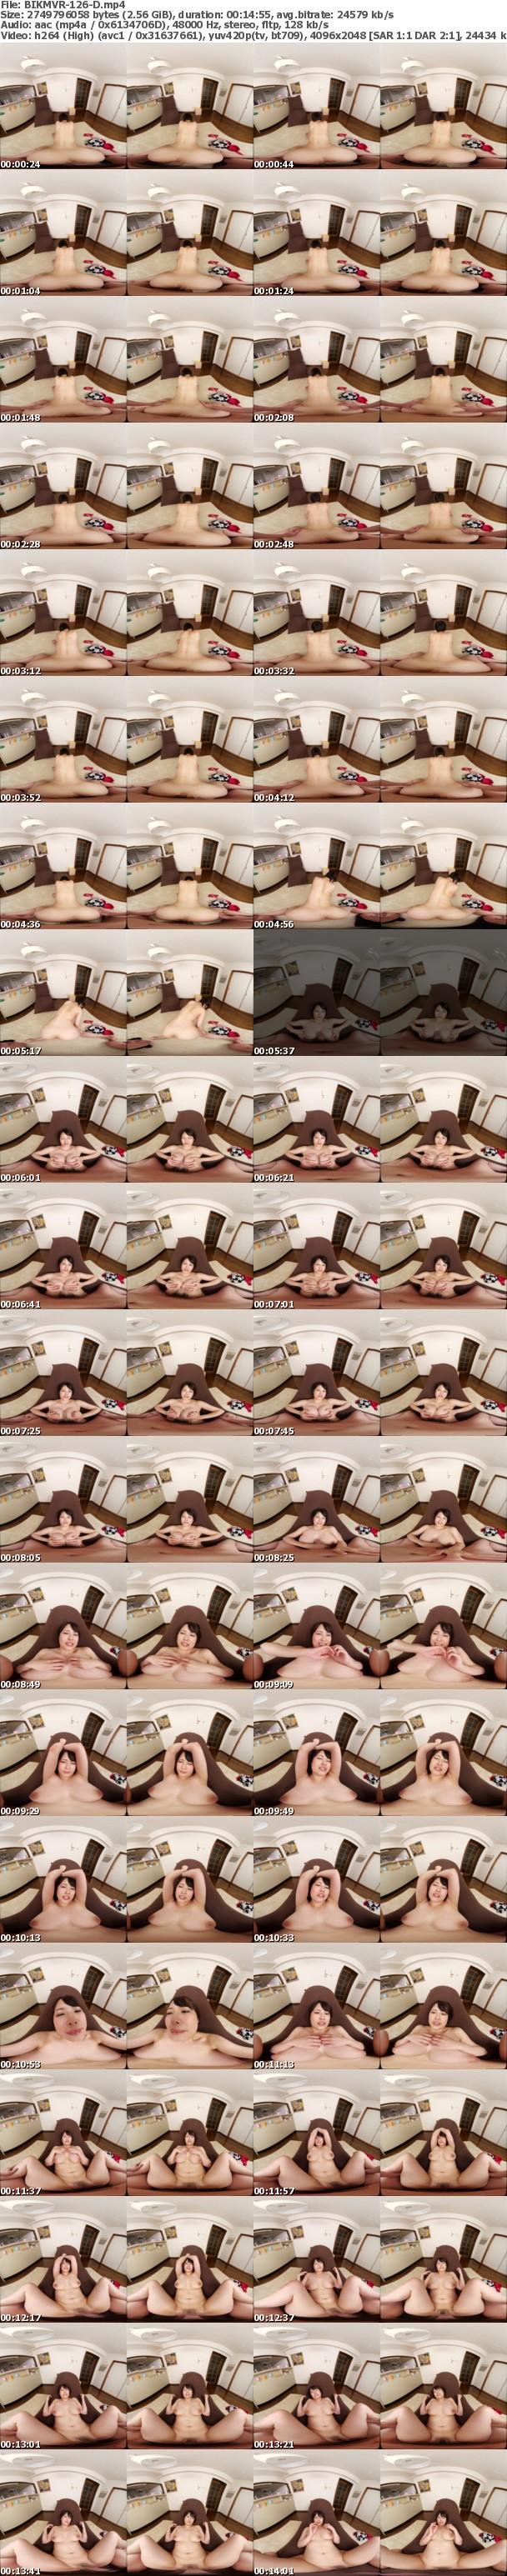 (VR) (LR) BIKMVR-126 「セフレになろうよ」'ちょろ'すぎる新人巨乳デリヘル嬢に連続射精(ダ)しまくり2 真田みづ稀